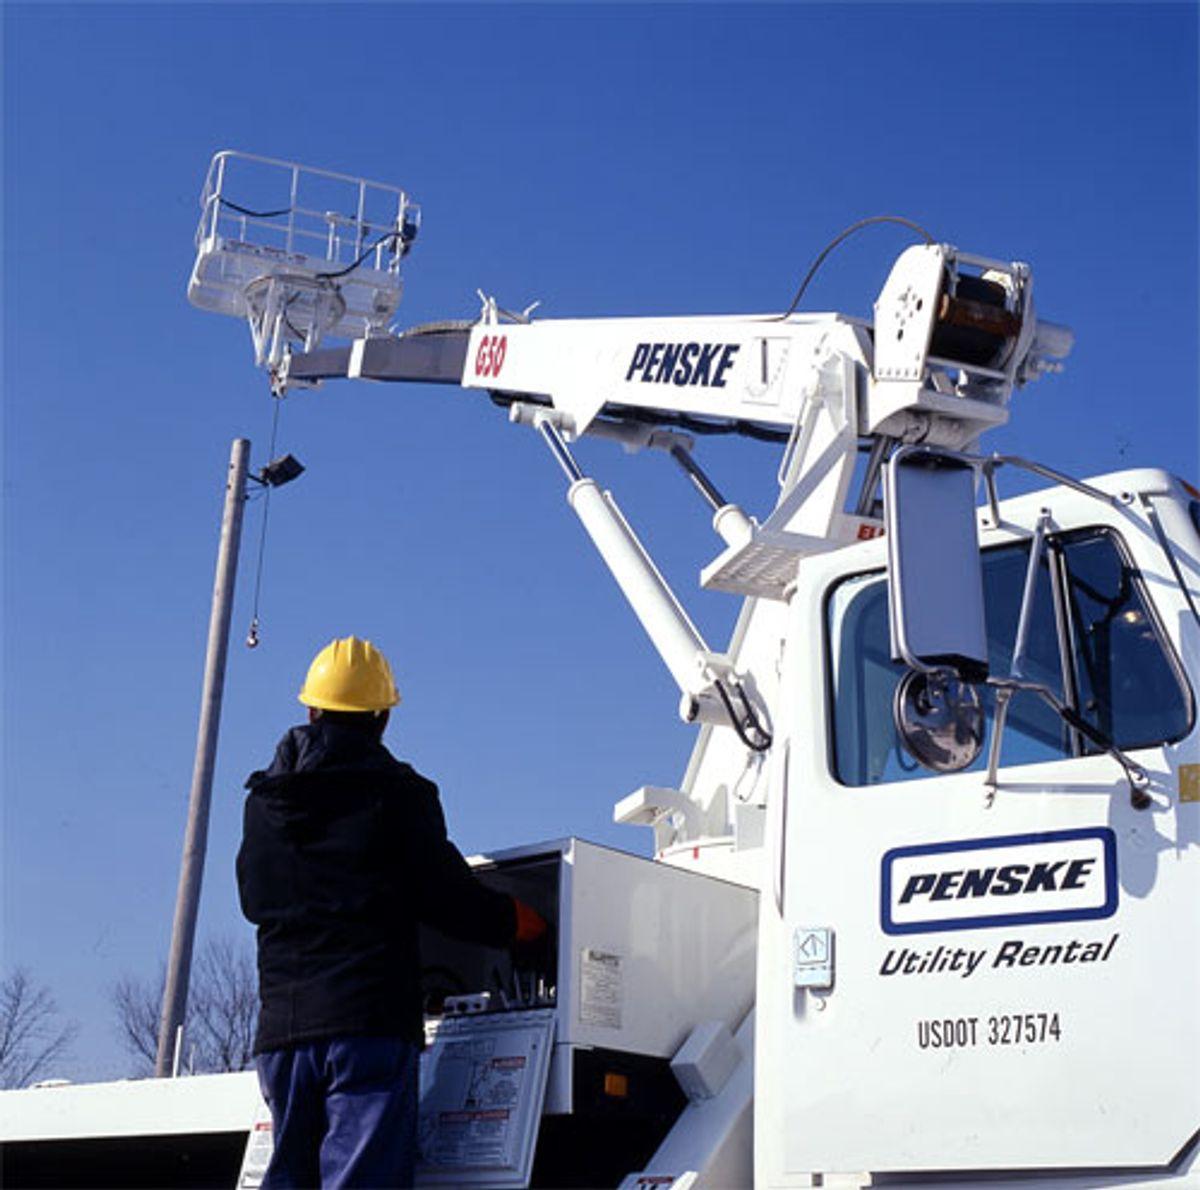 Penske Sells Daily Utility Vehicle Rental Assets to NESCO